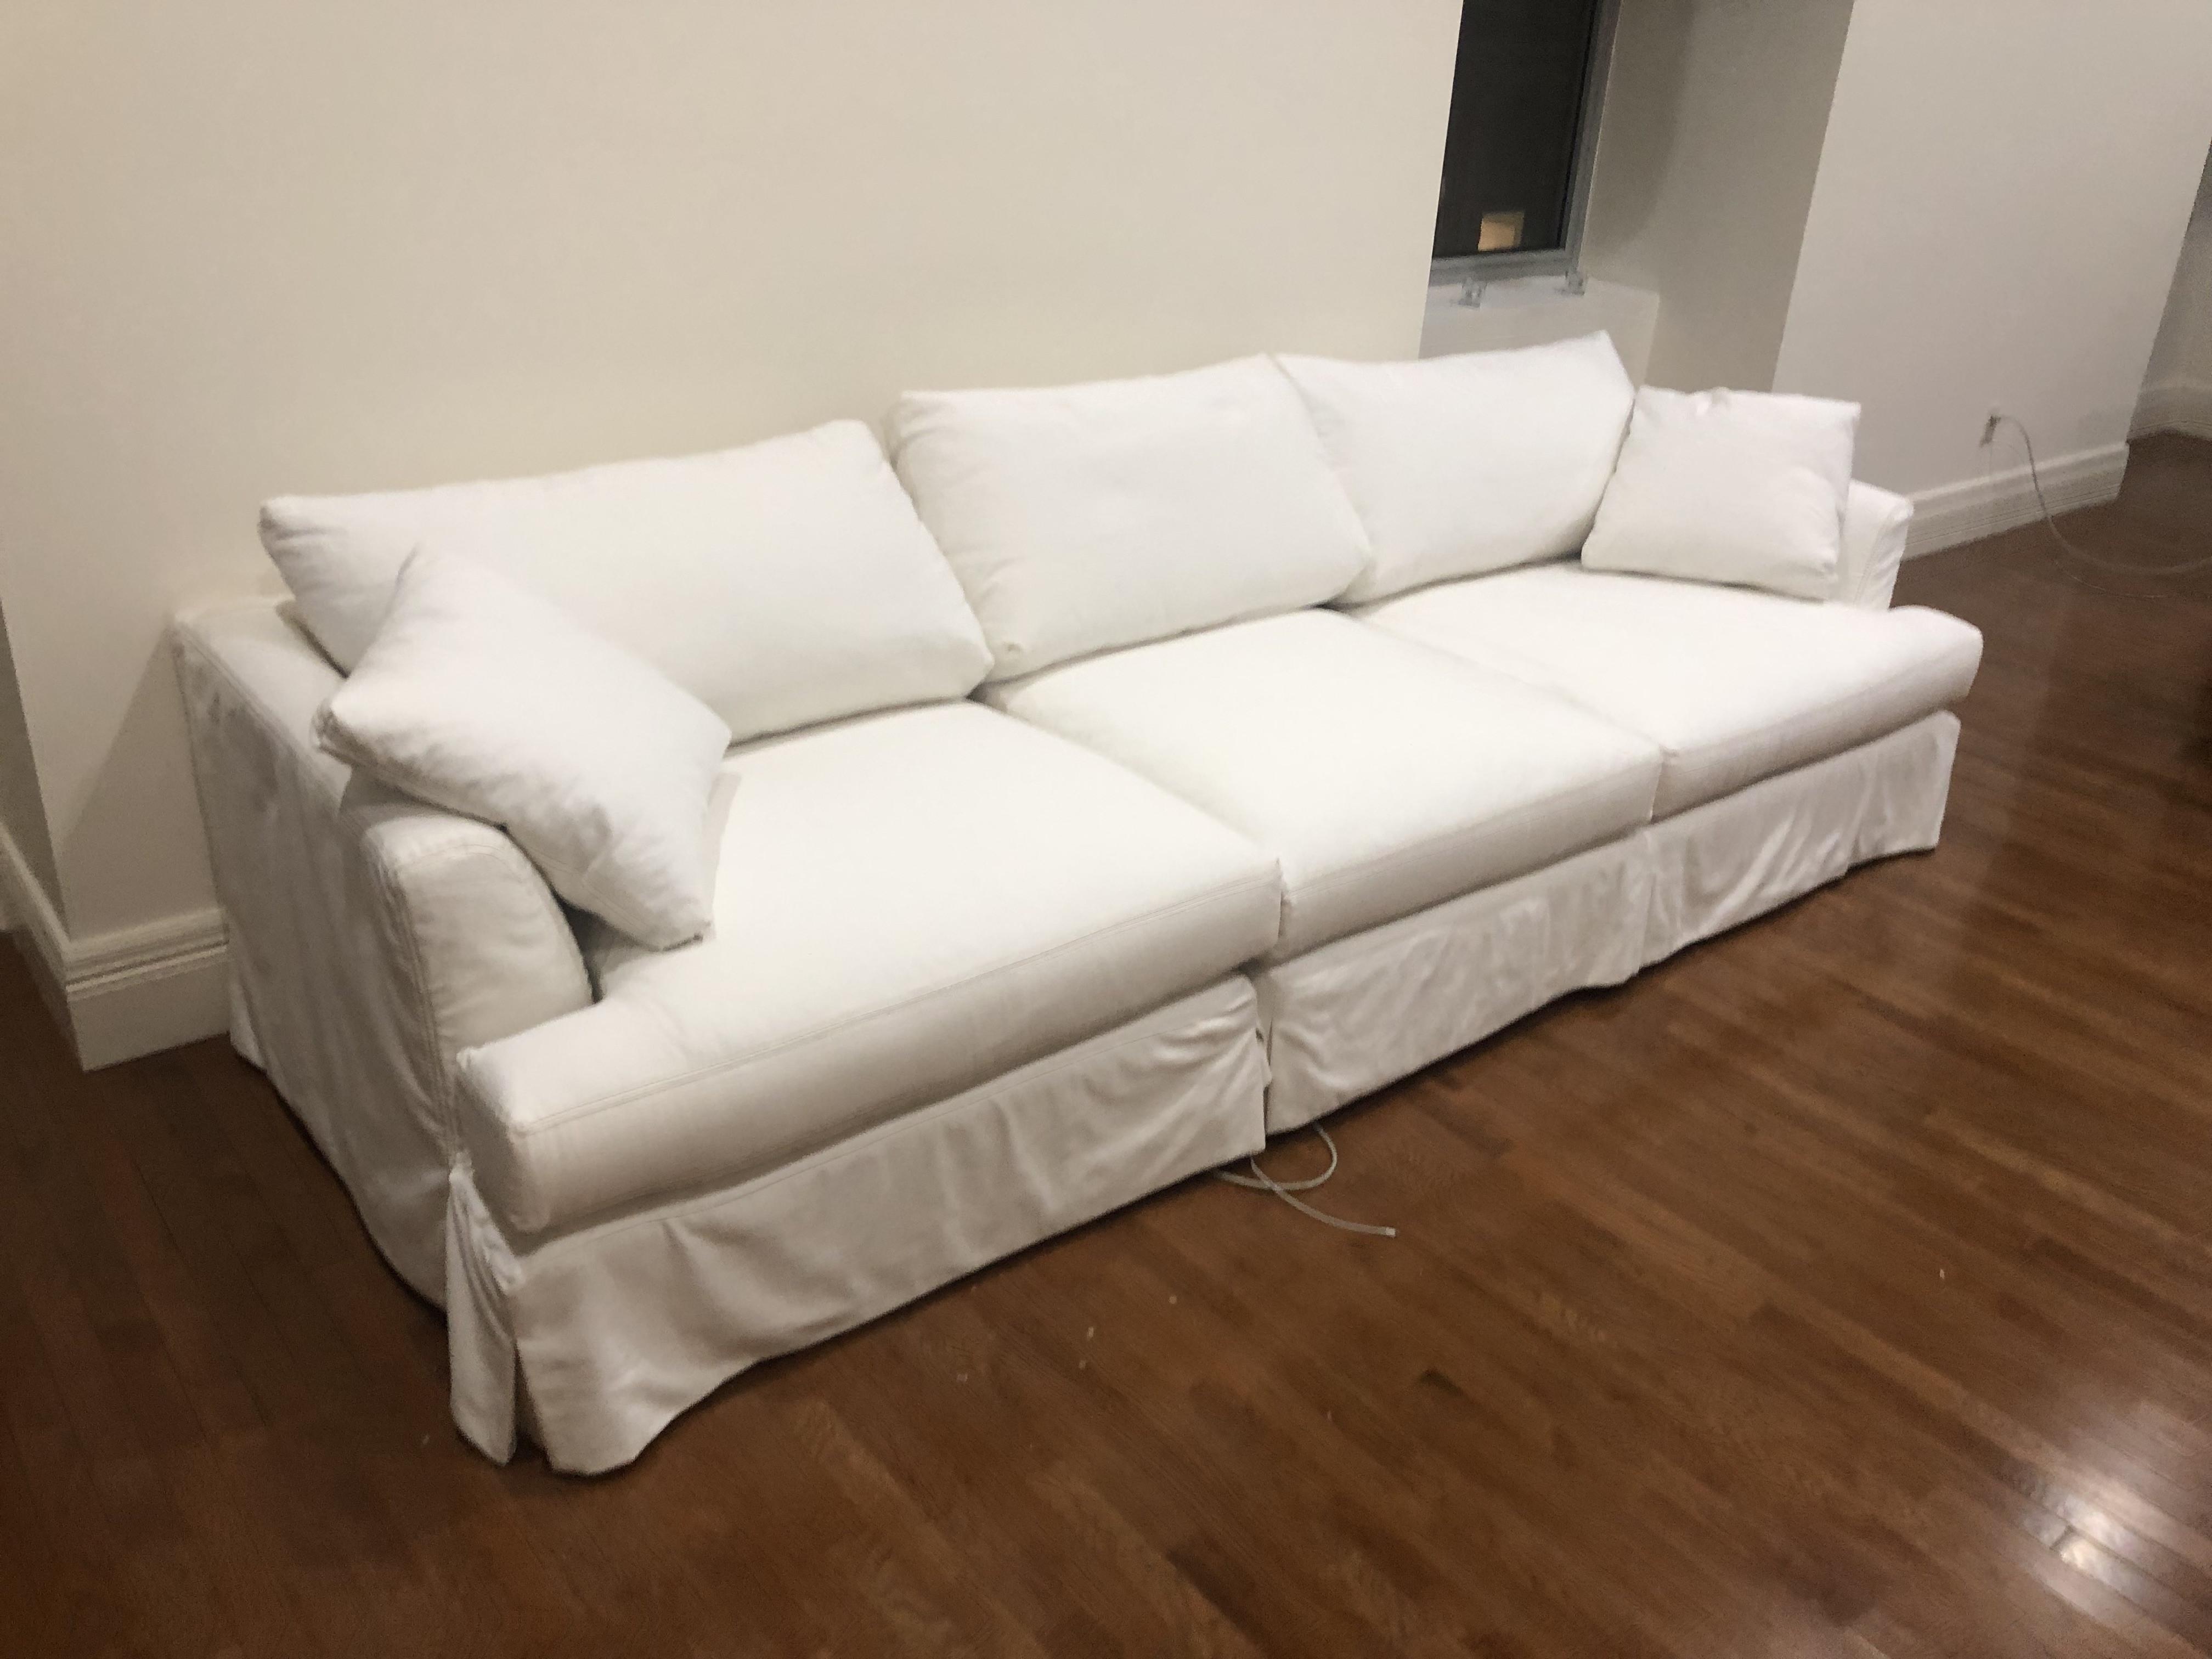 Arhaus White 3-Piece Sectional Sofa